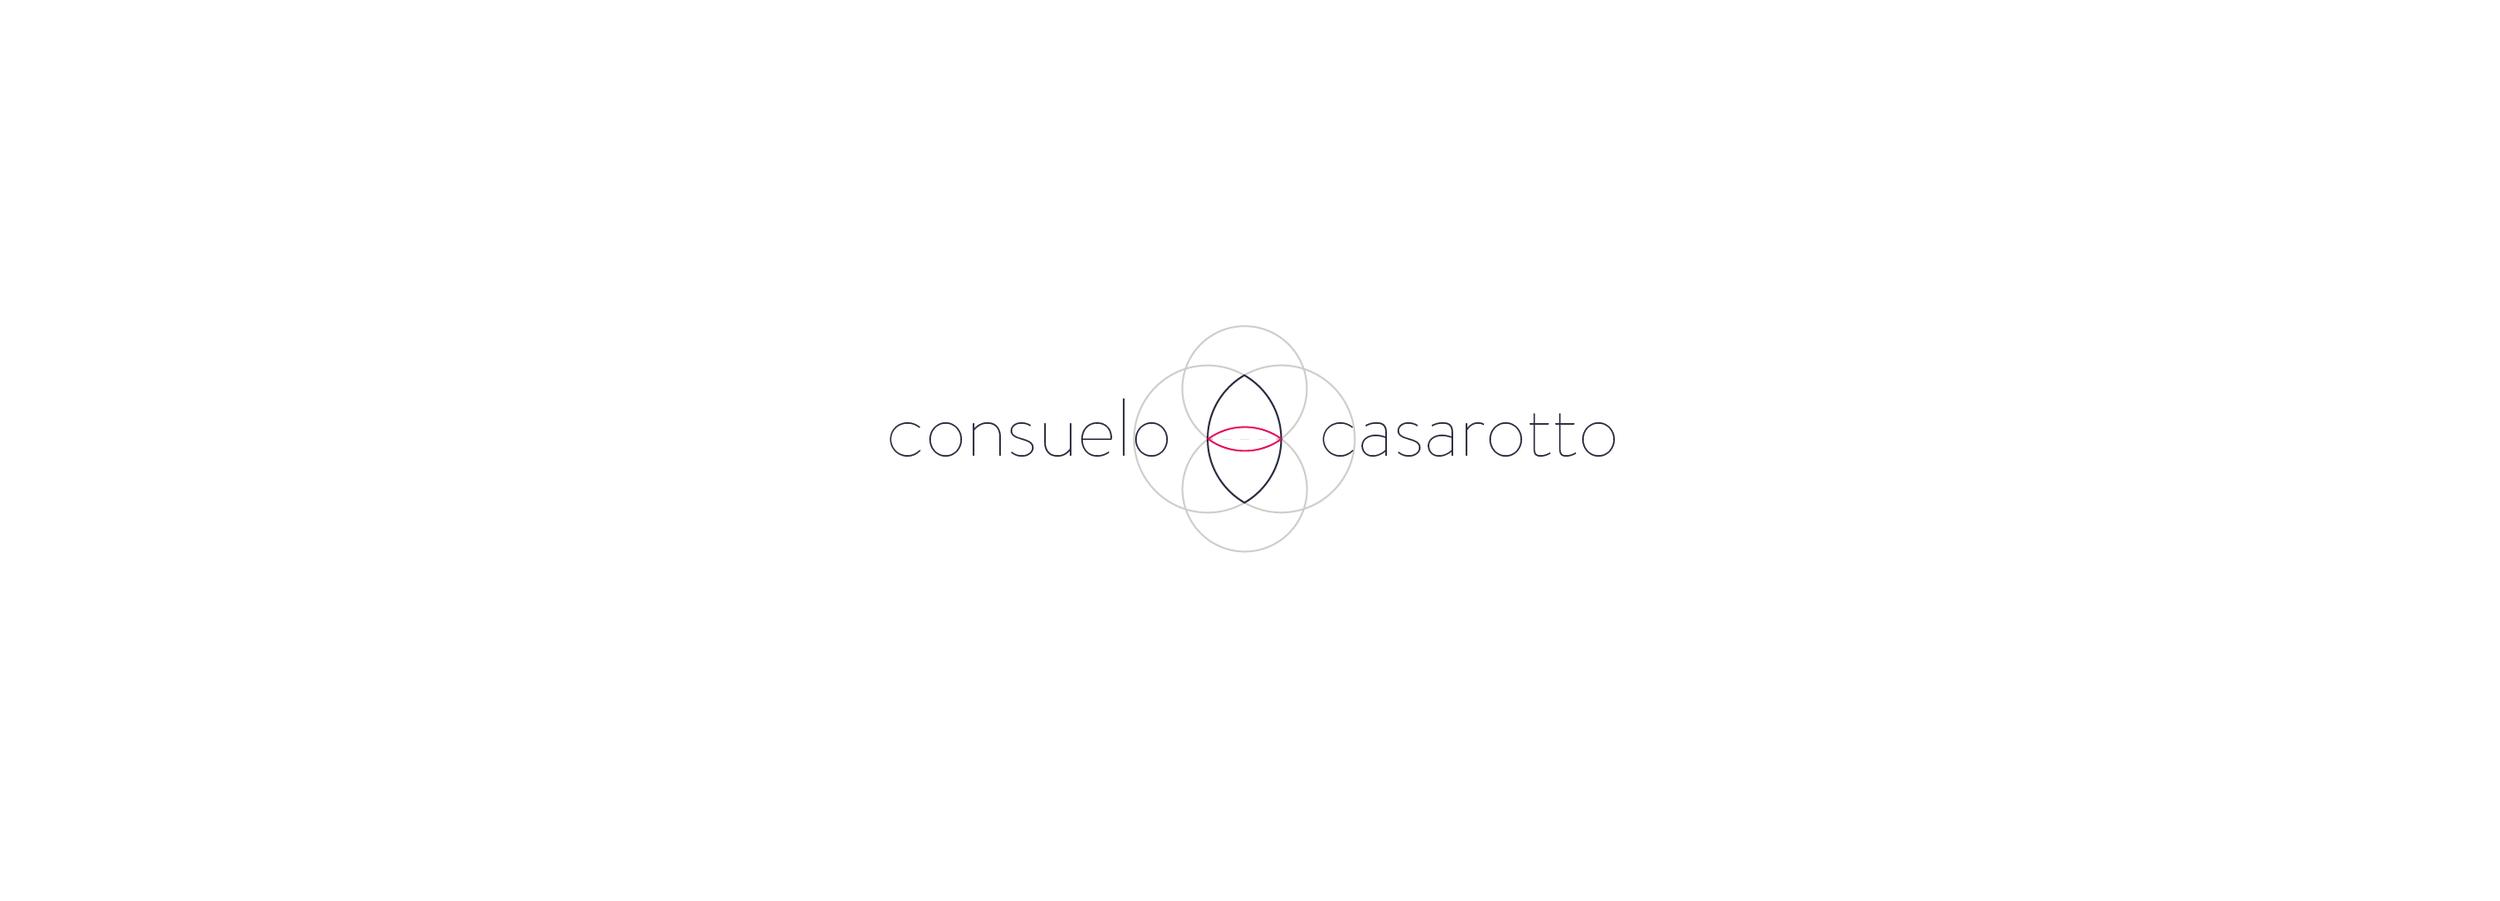 Consuelo Casarotto Brand Filter-12.png